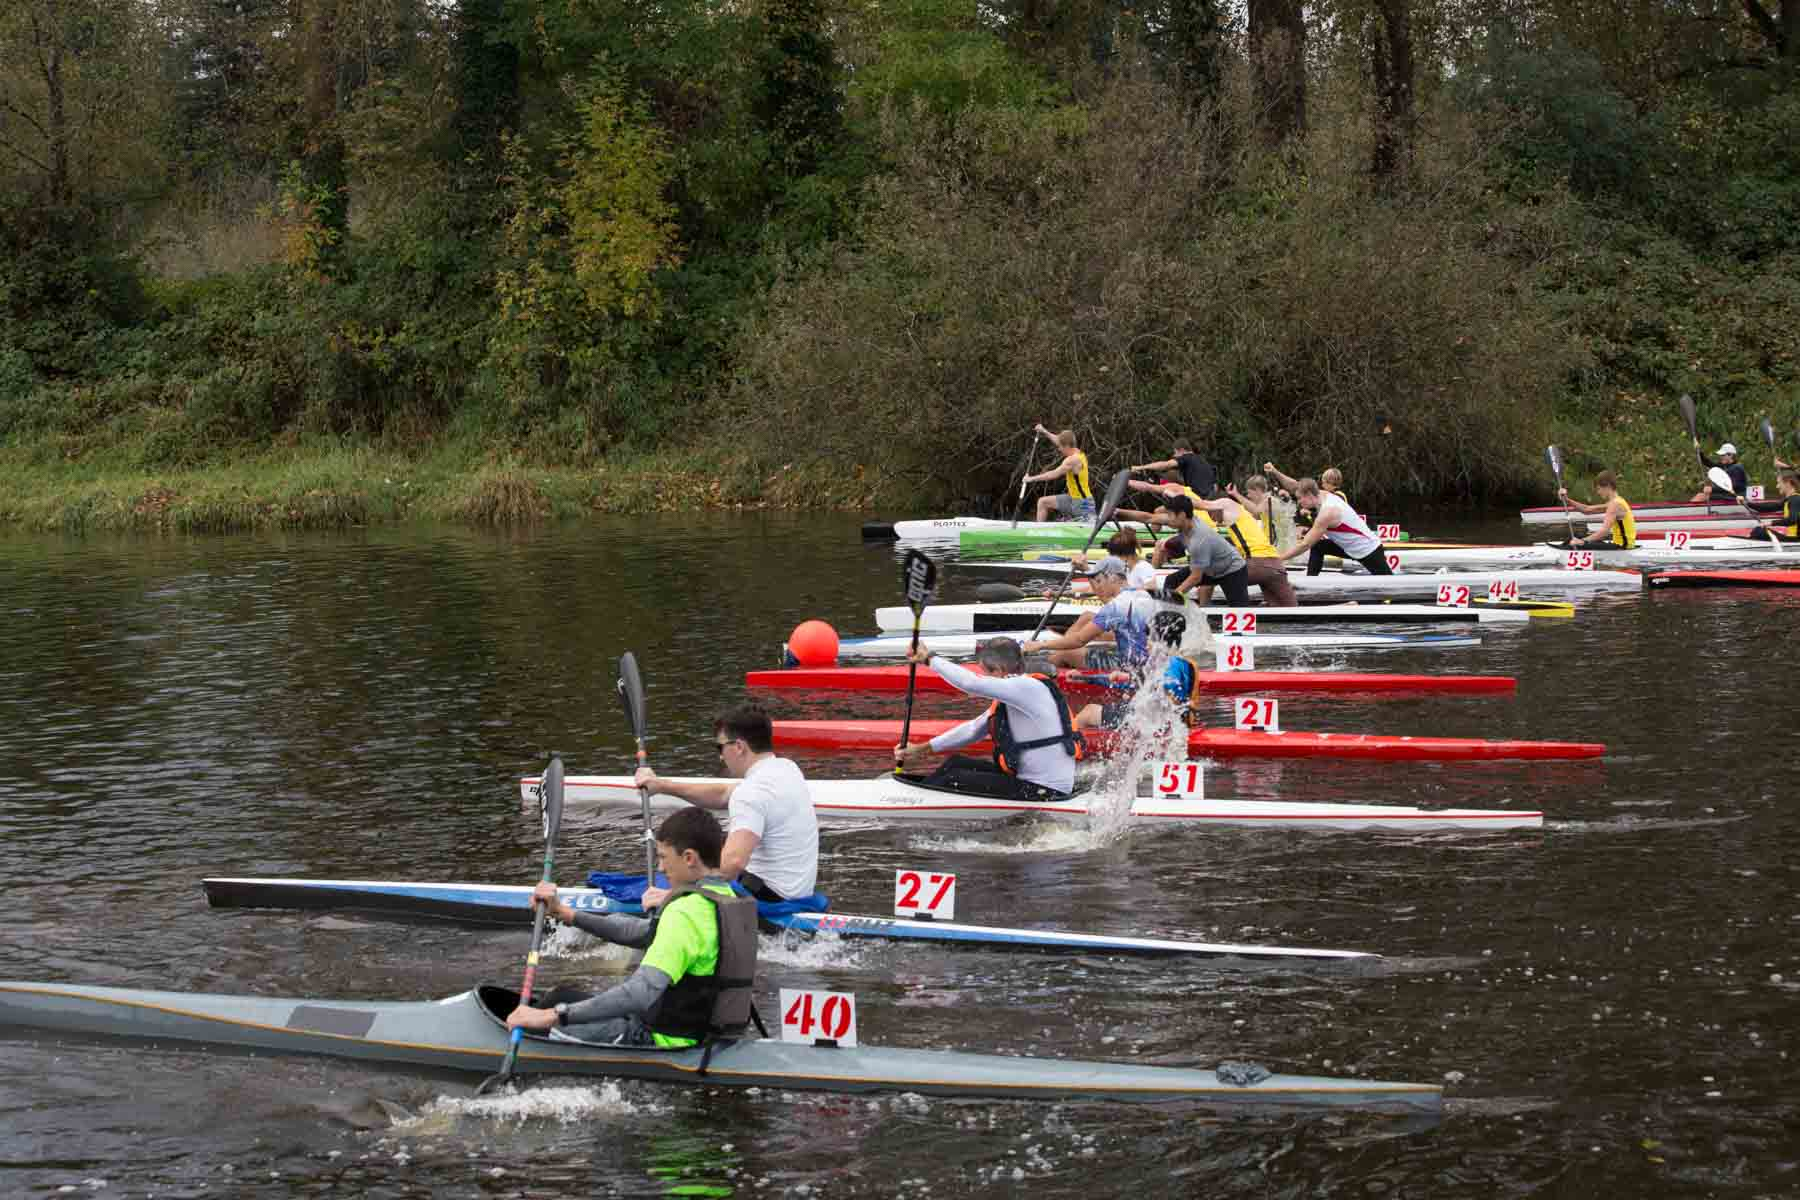 Kenmore Race 2014